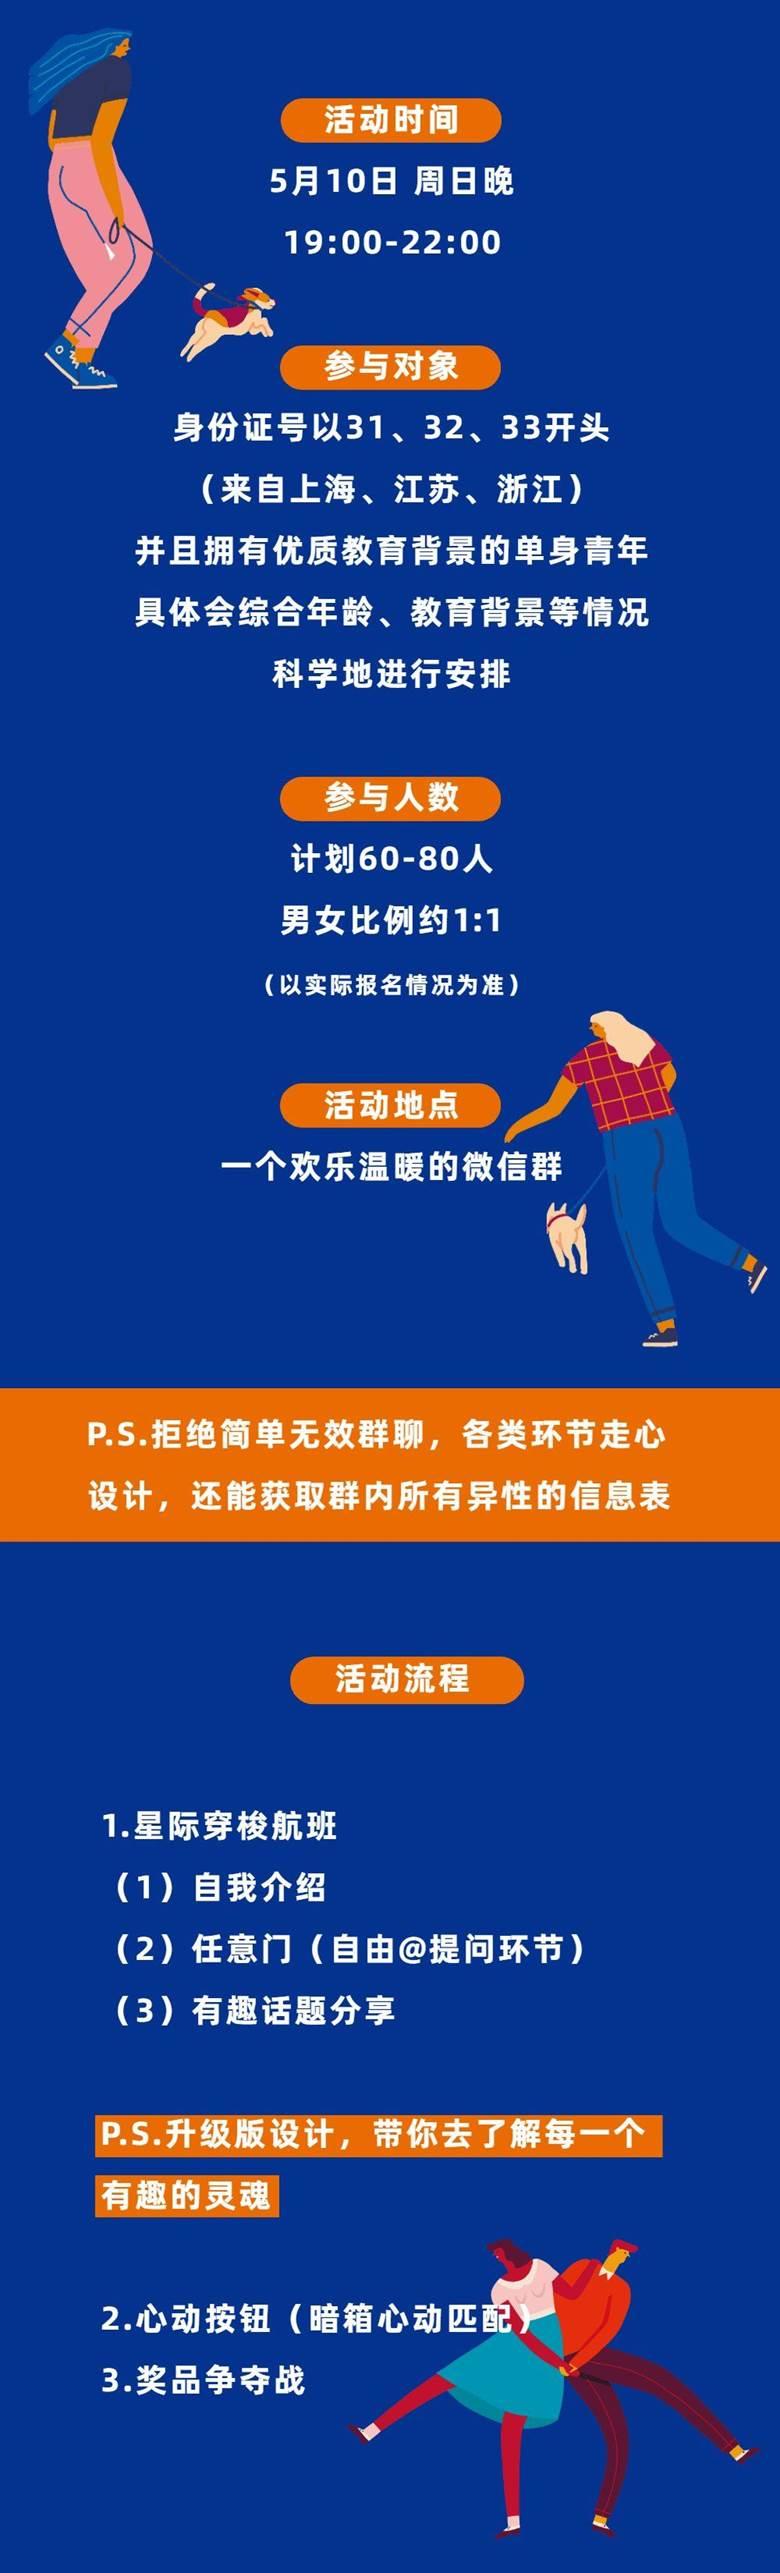 5.17苏州优质青年专场-3.png